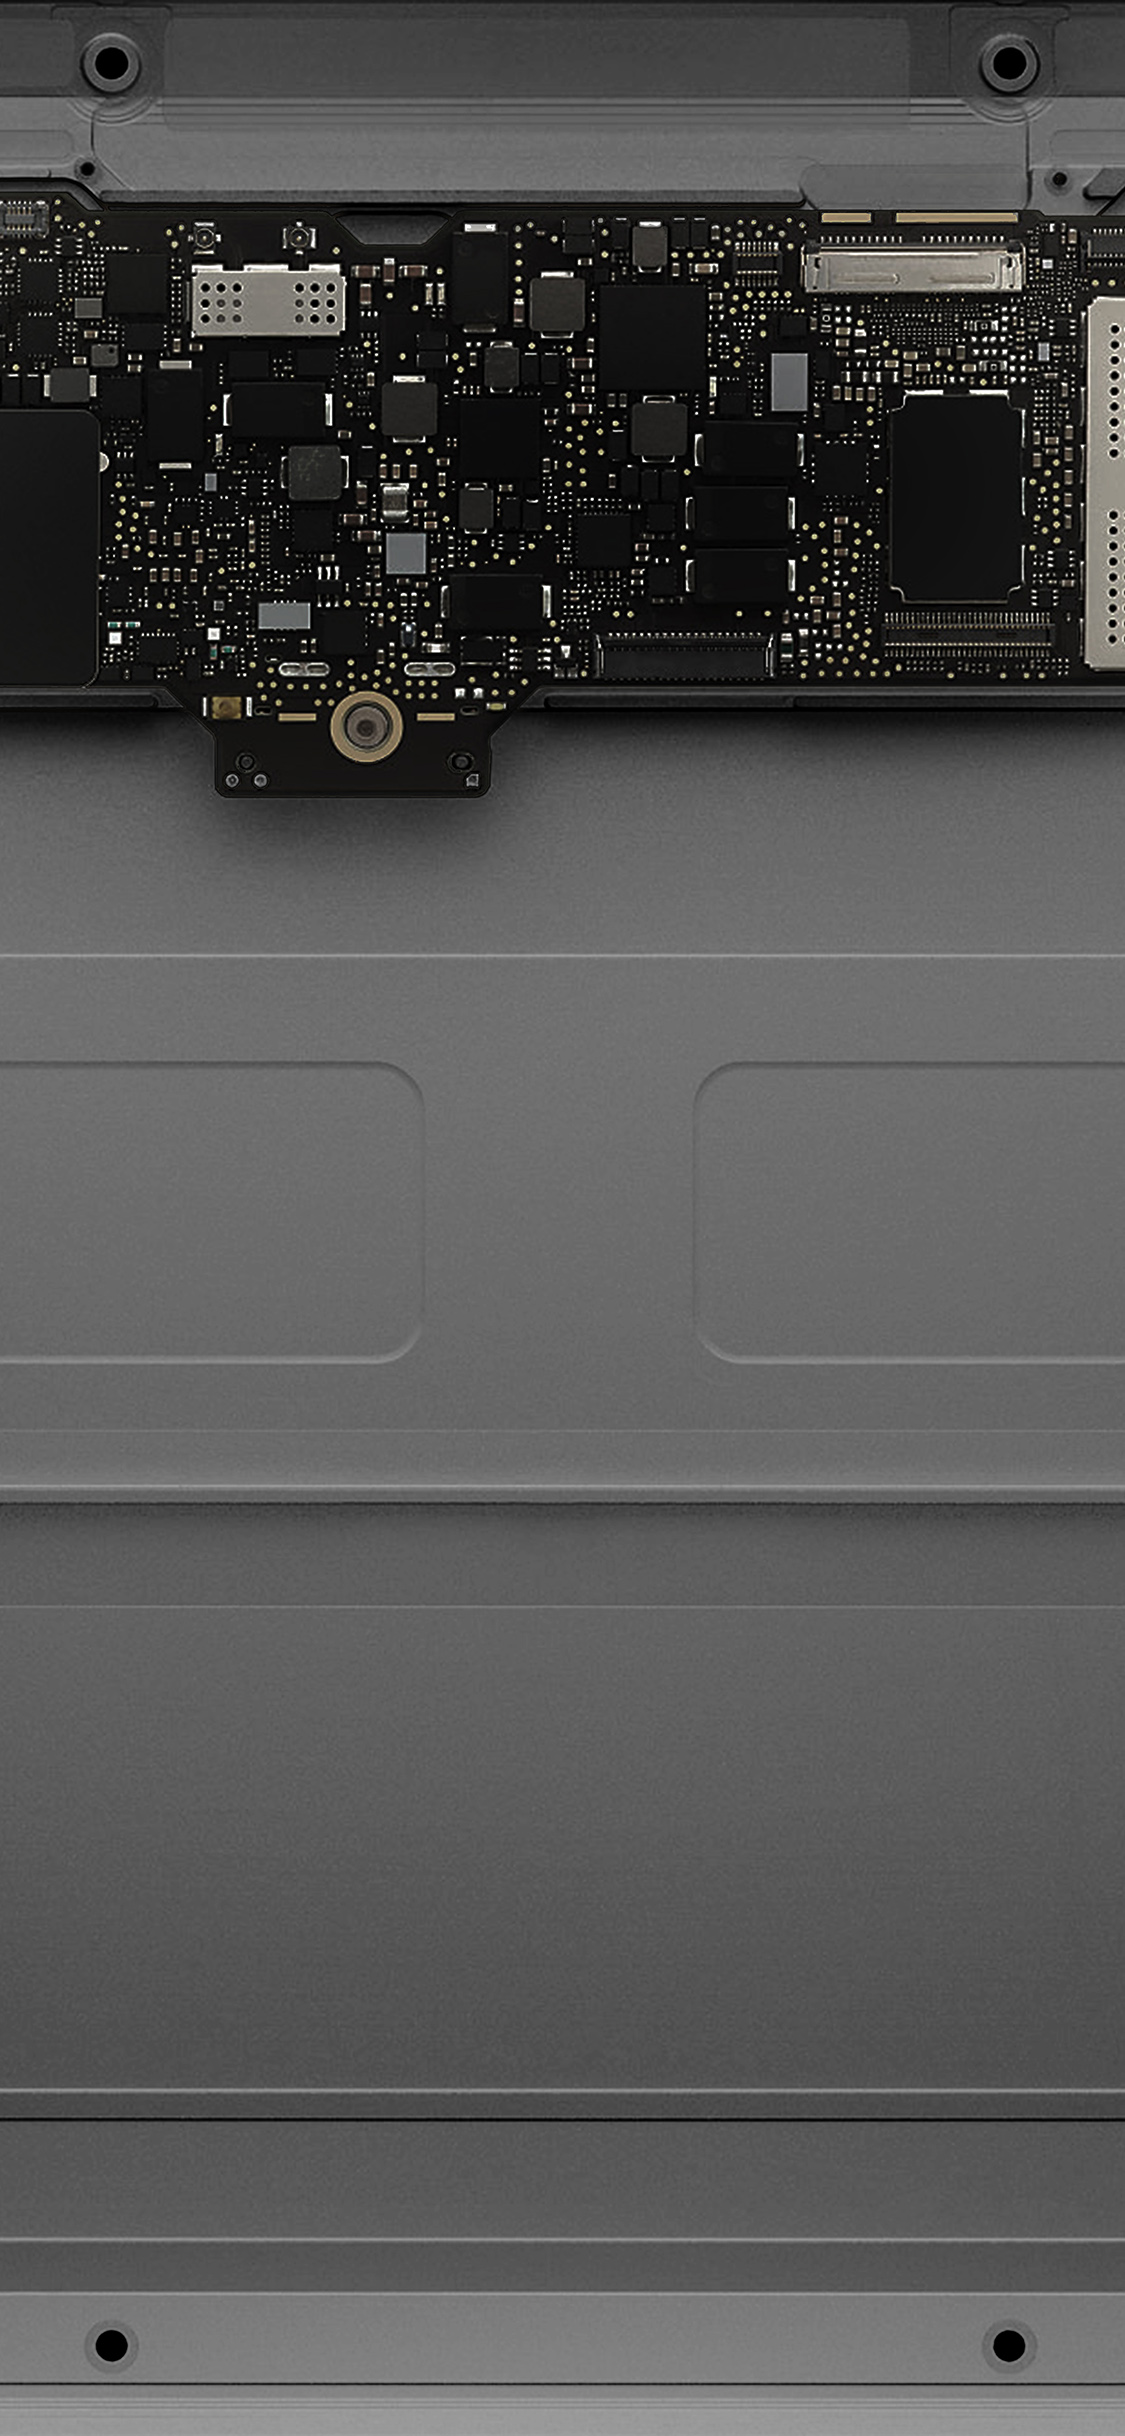 Iphonexpapers Com Iphone X Wallpaper Ak37 Inside Apple Mackbook